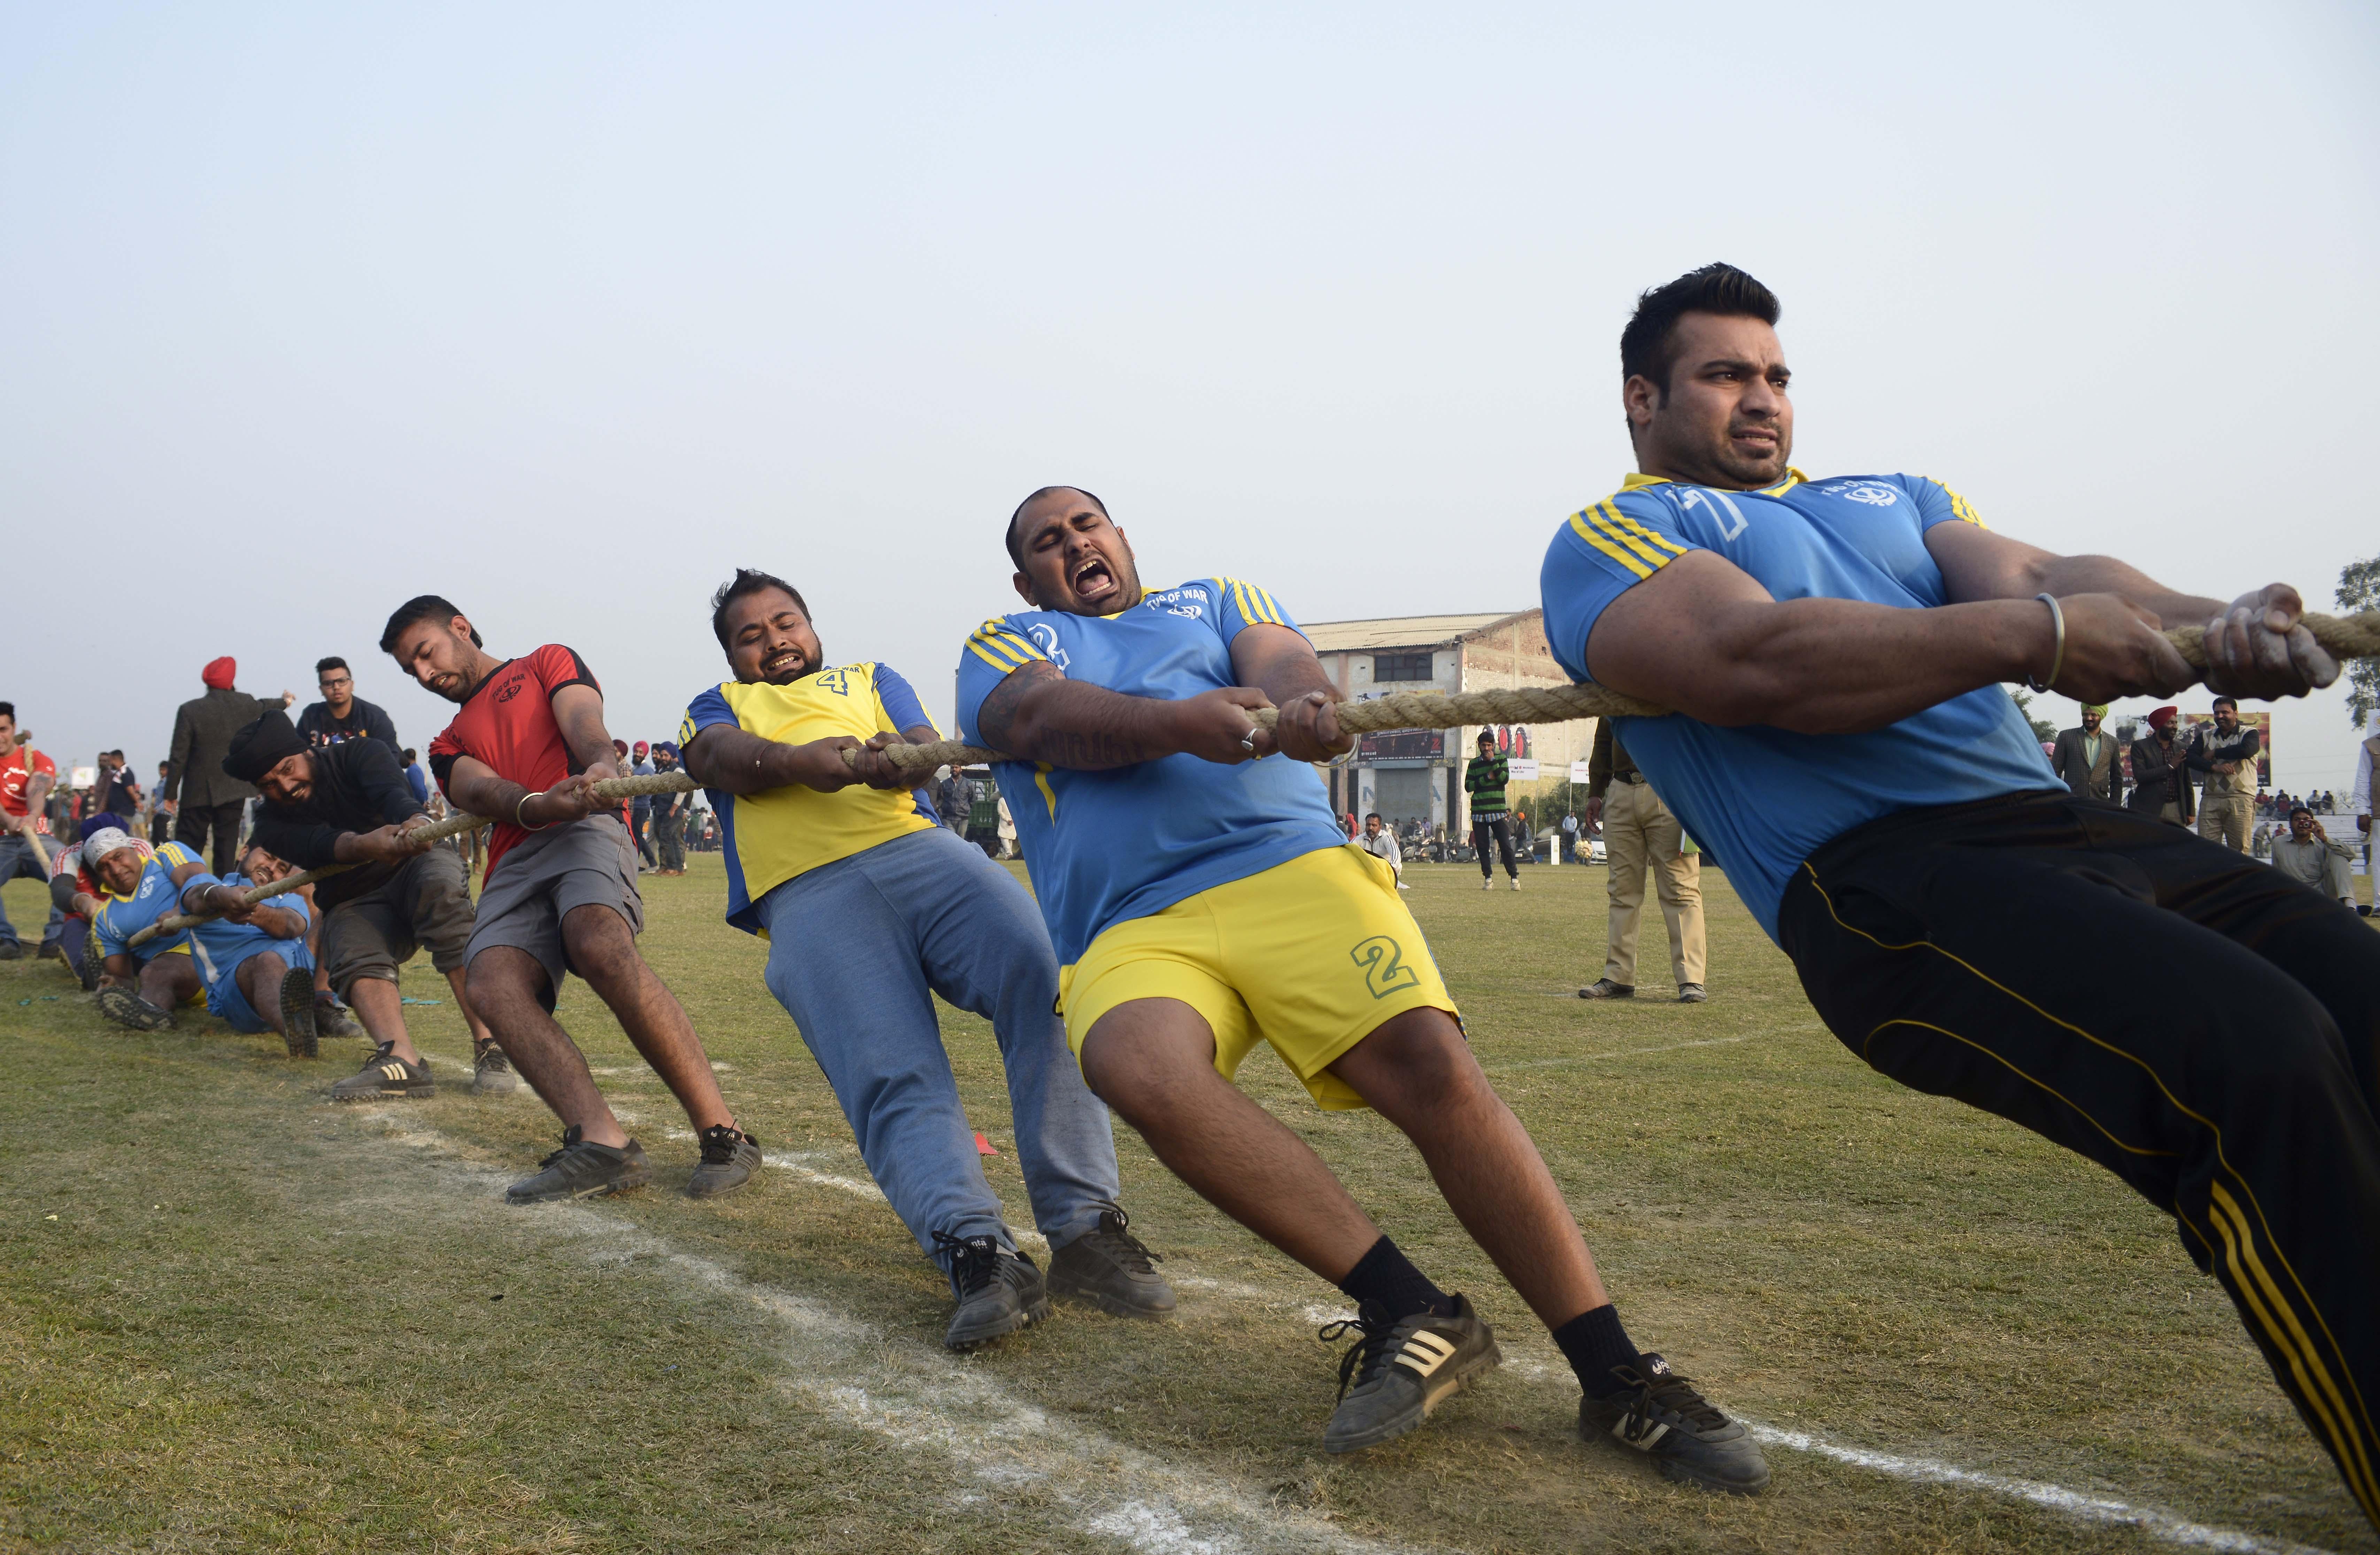 India's Rural Olympics